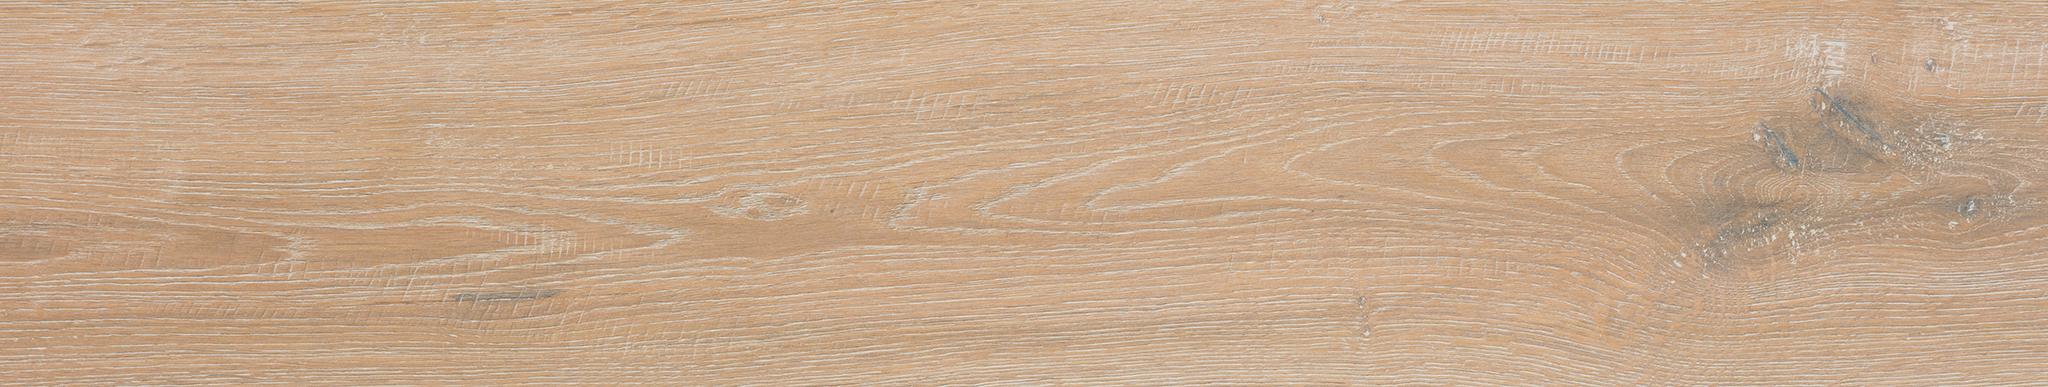 eterna Loc 8 XL oak white dust